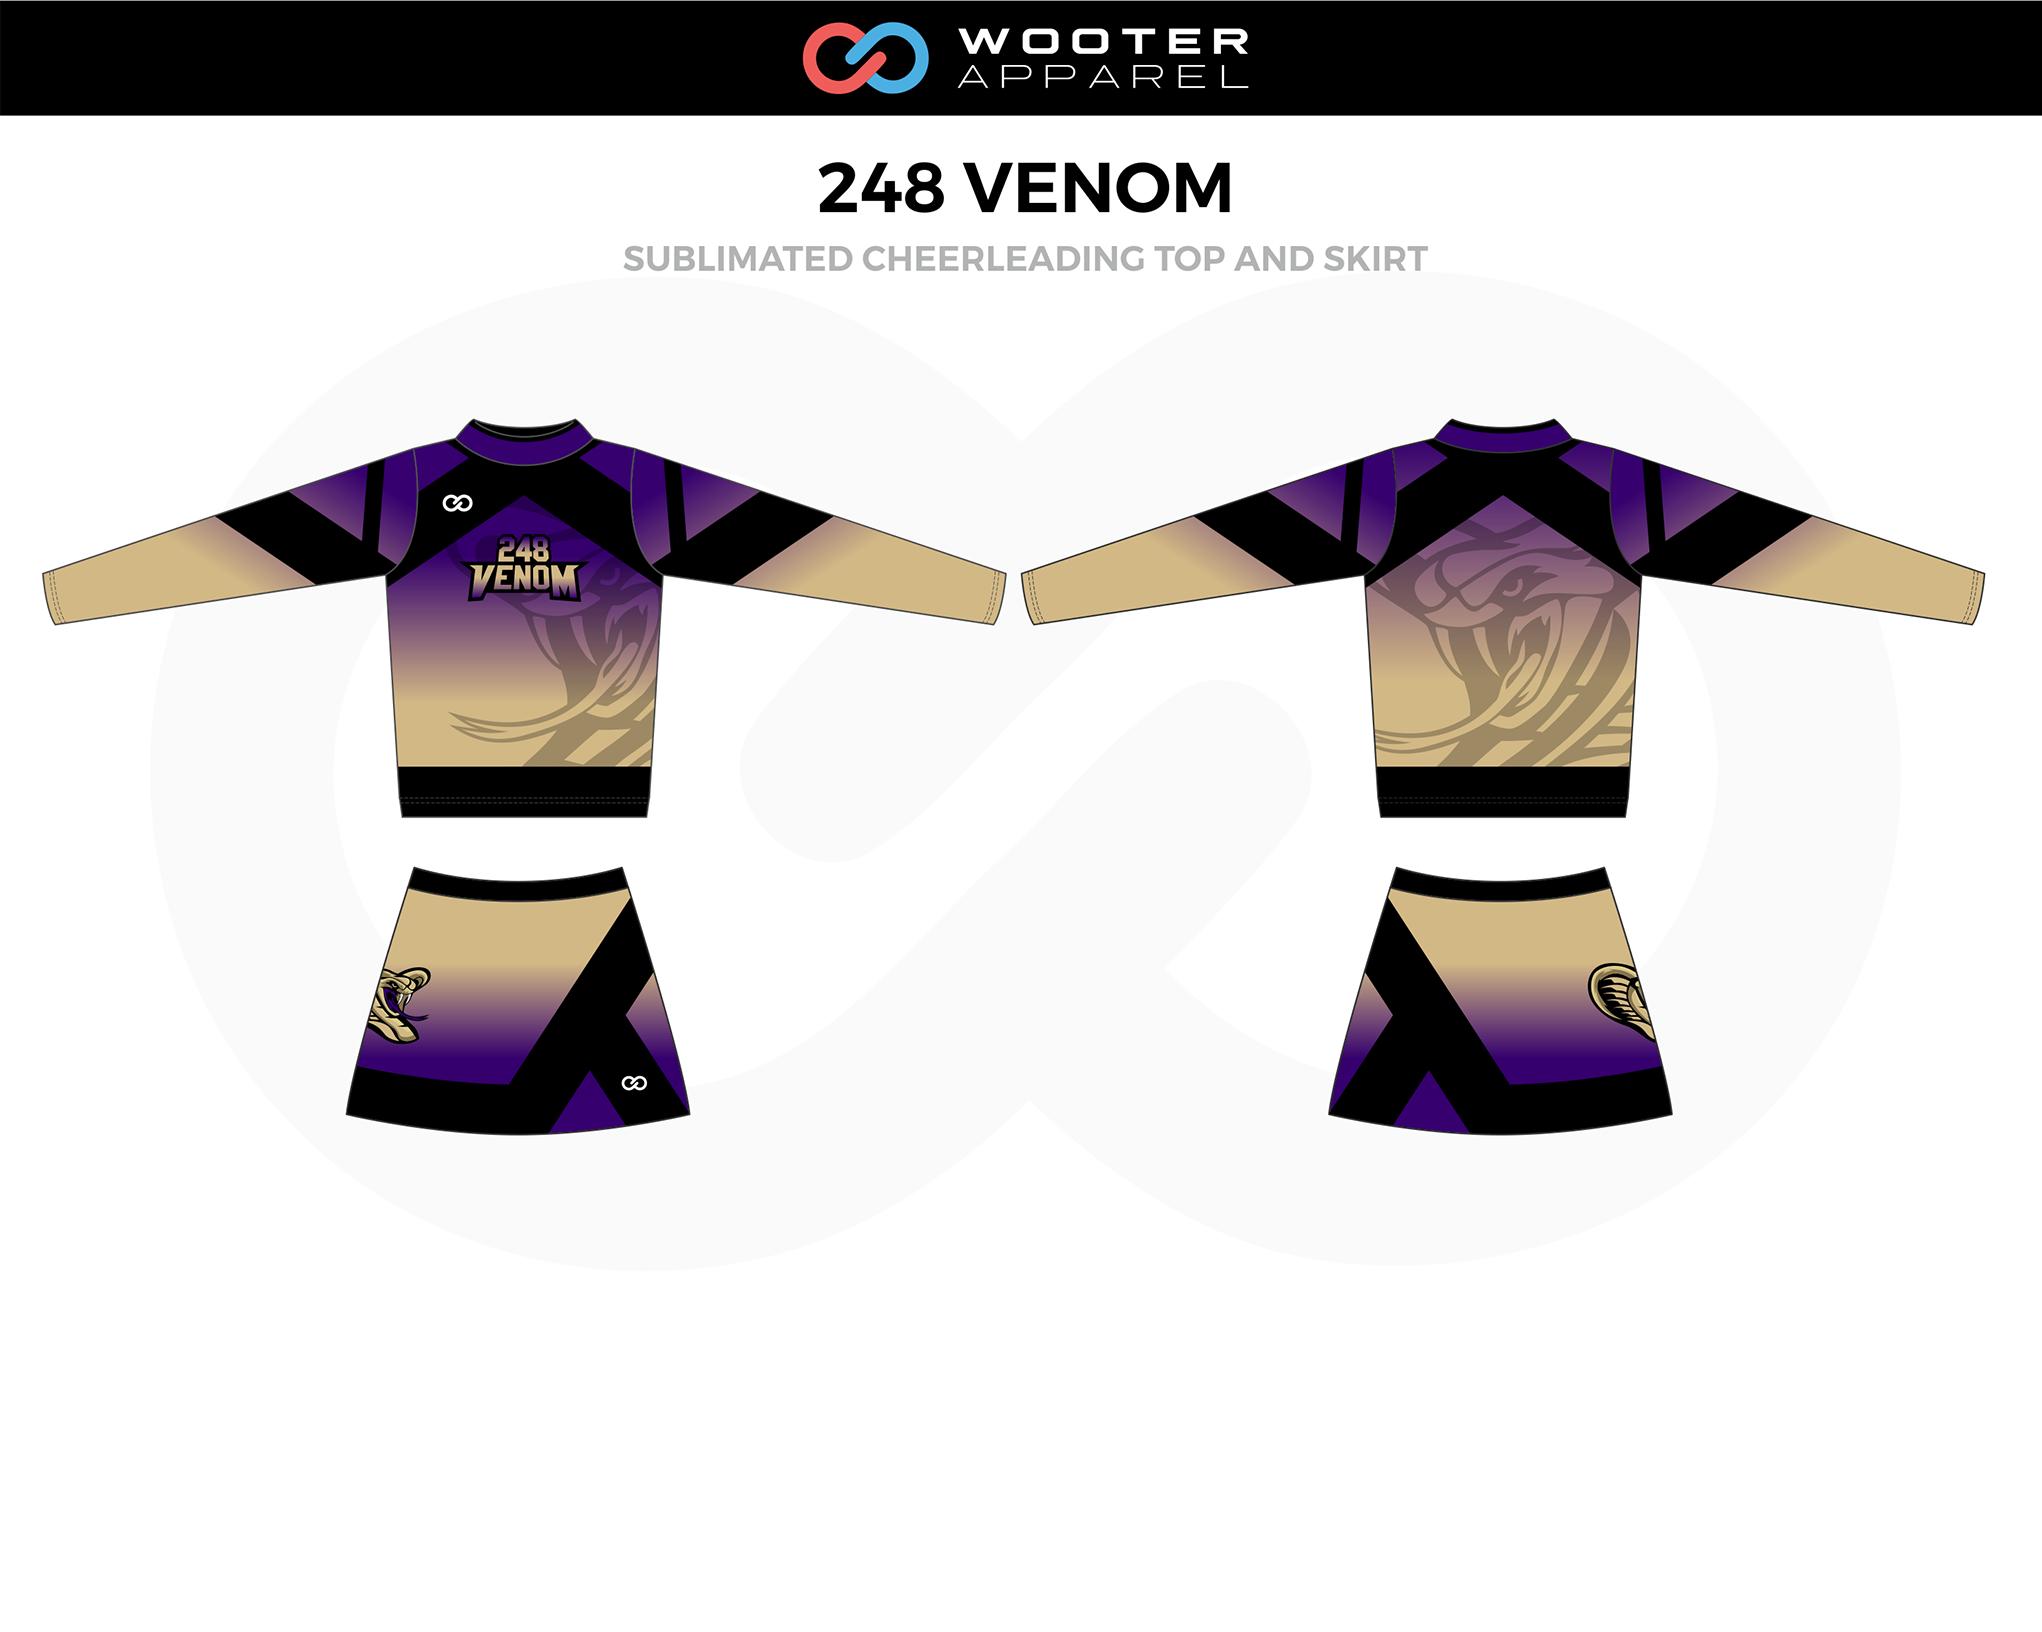 248 VENOM Brown Lavender Black Cheer Uniform, Top and Skirt